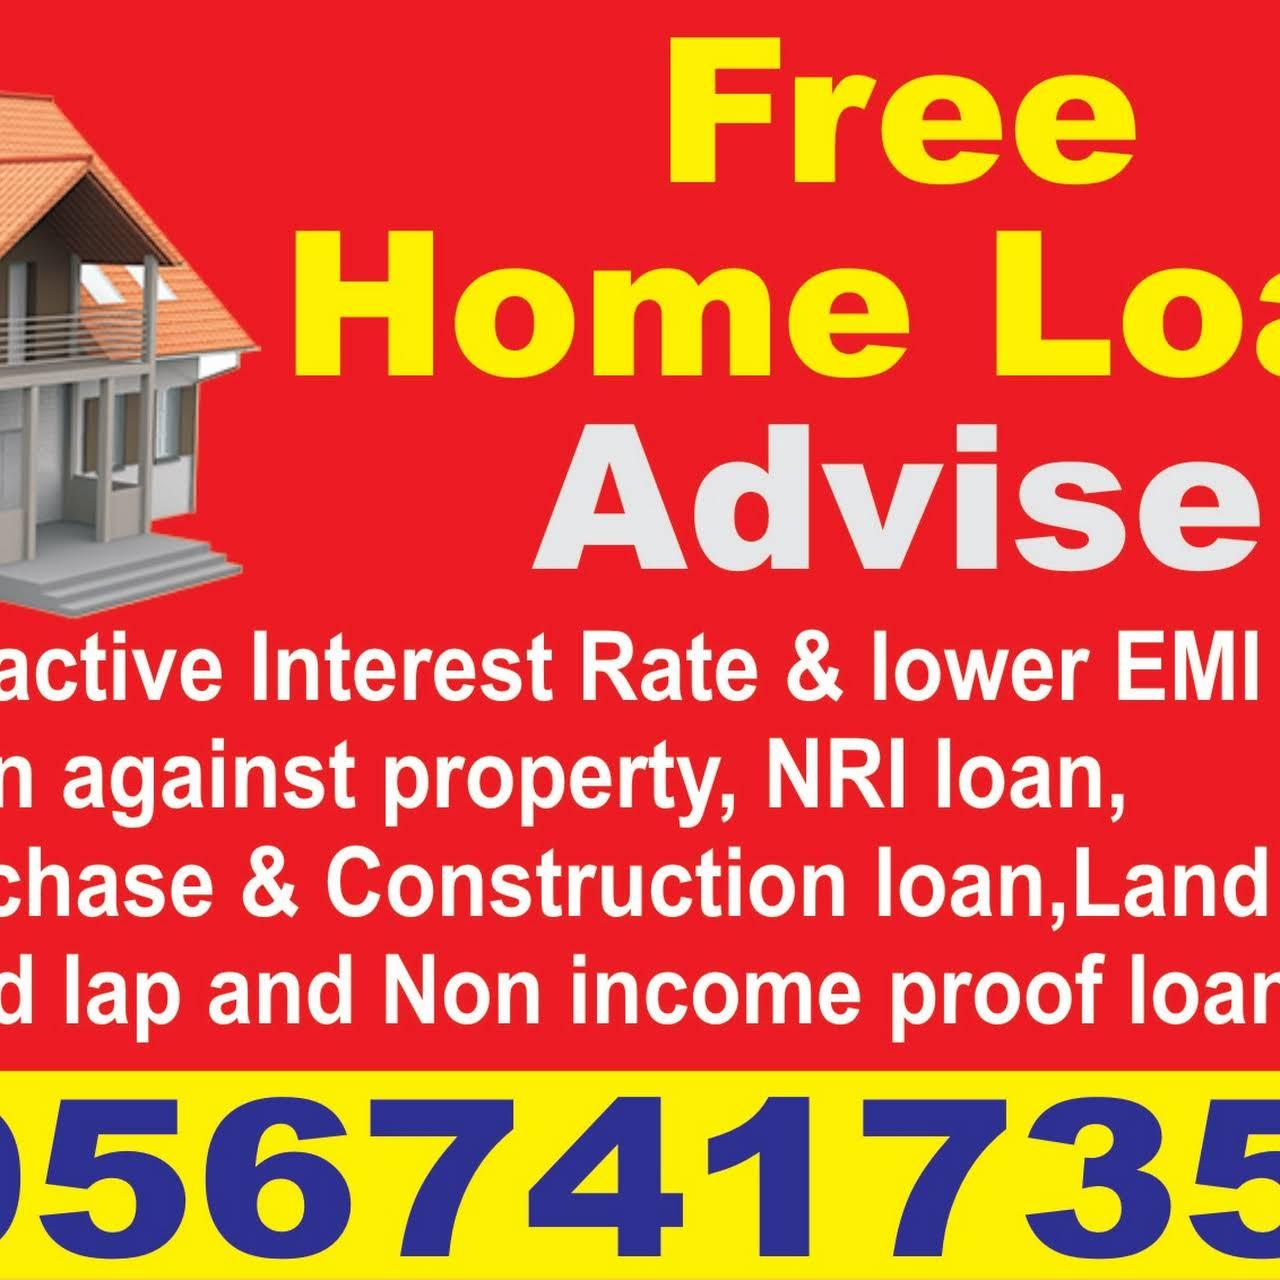 Home Loans Kerala - House Loan Agency in ernakulam